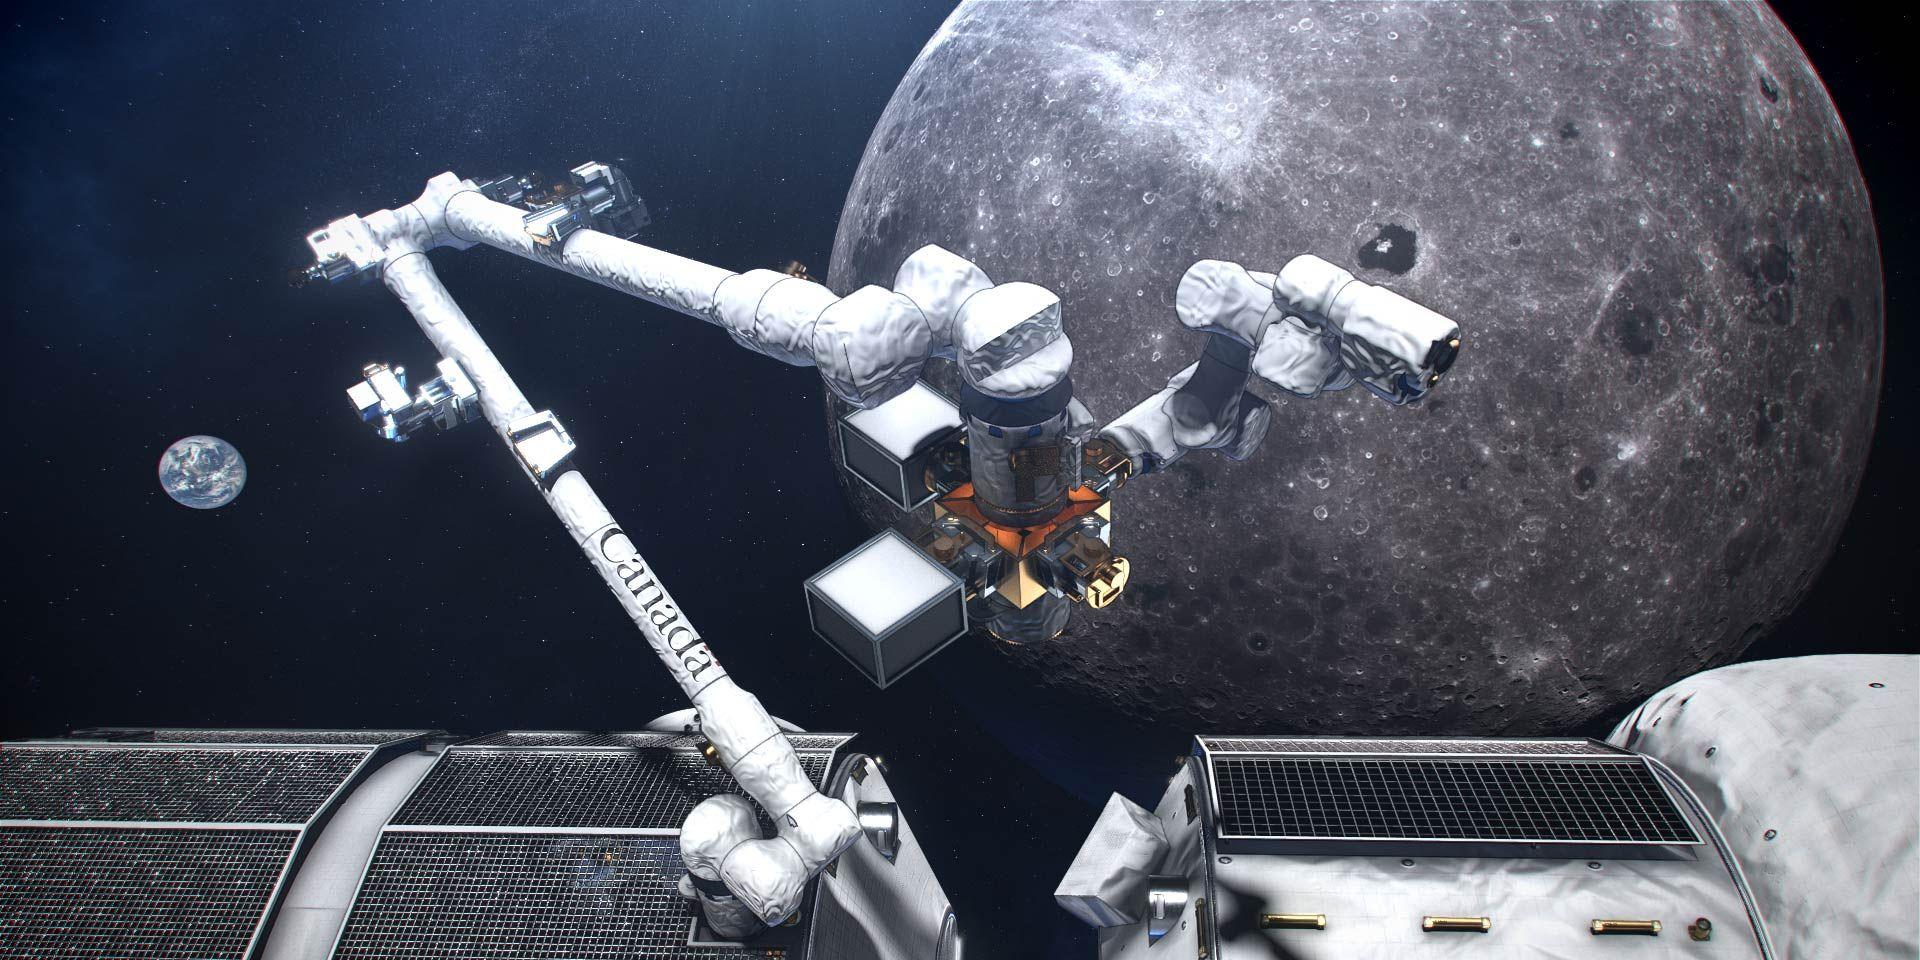 canadarm3 space moon canada arm